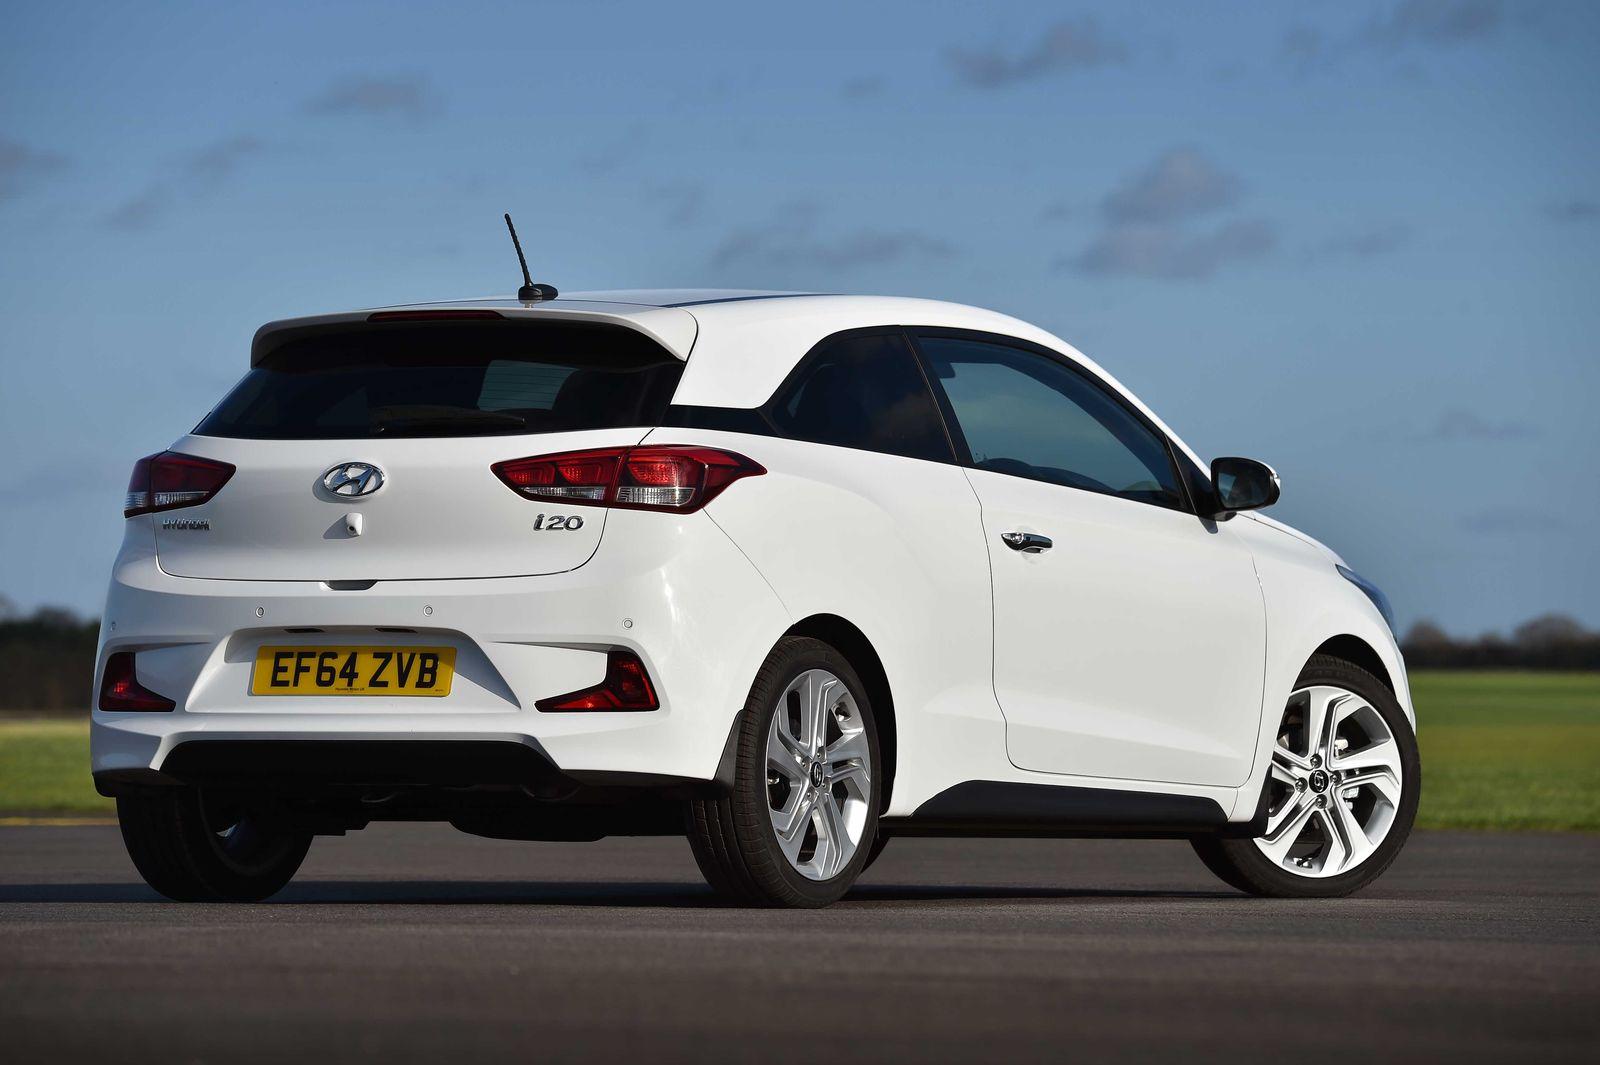 2015 Hyundai I20 Coupe UK Prices Announced